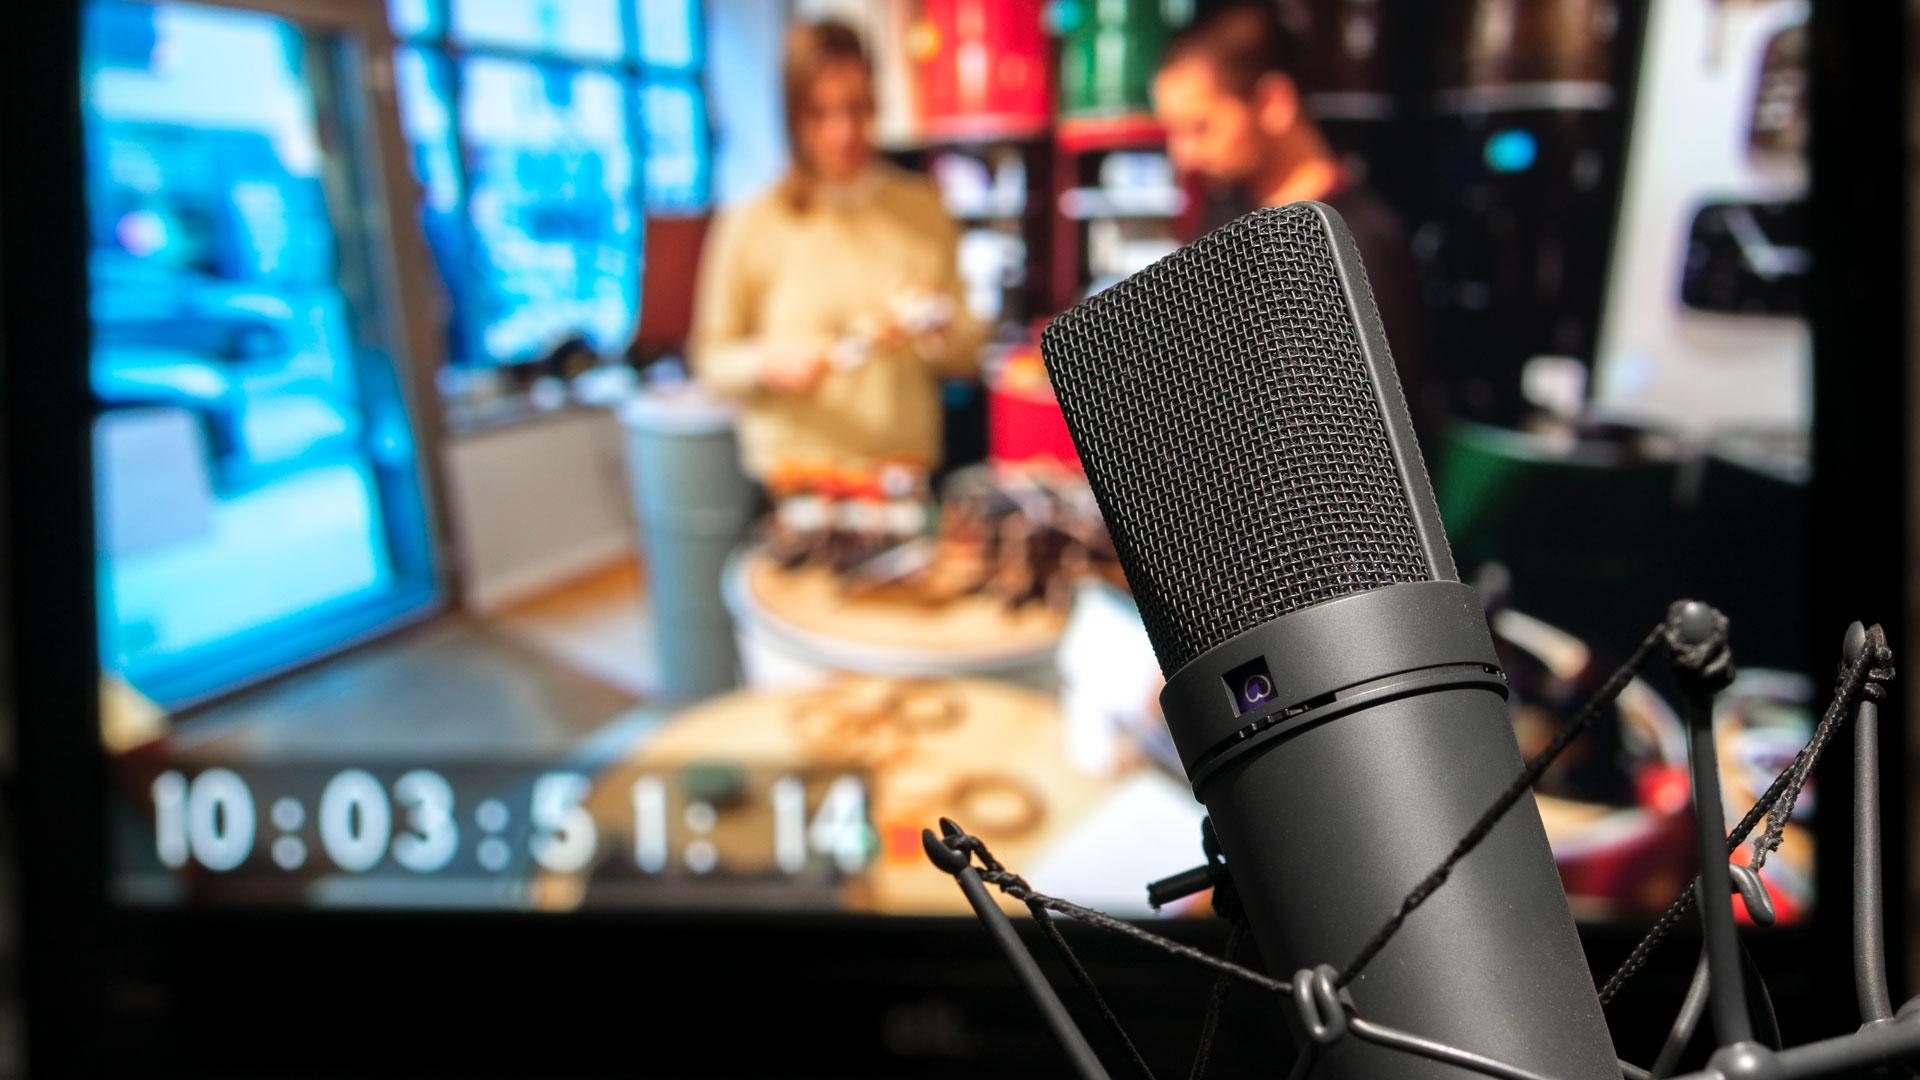 Sprecherkabine mit Mikrofon